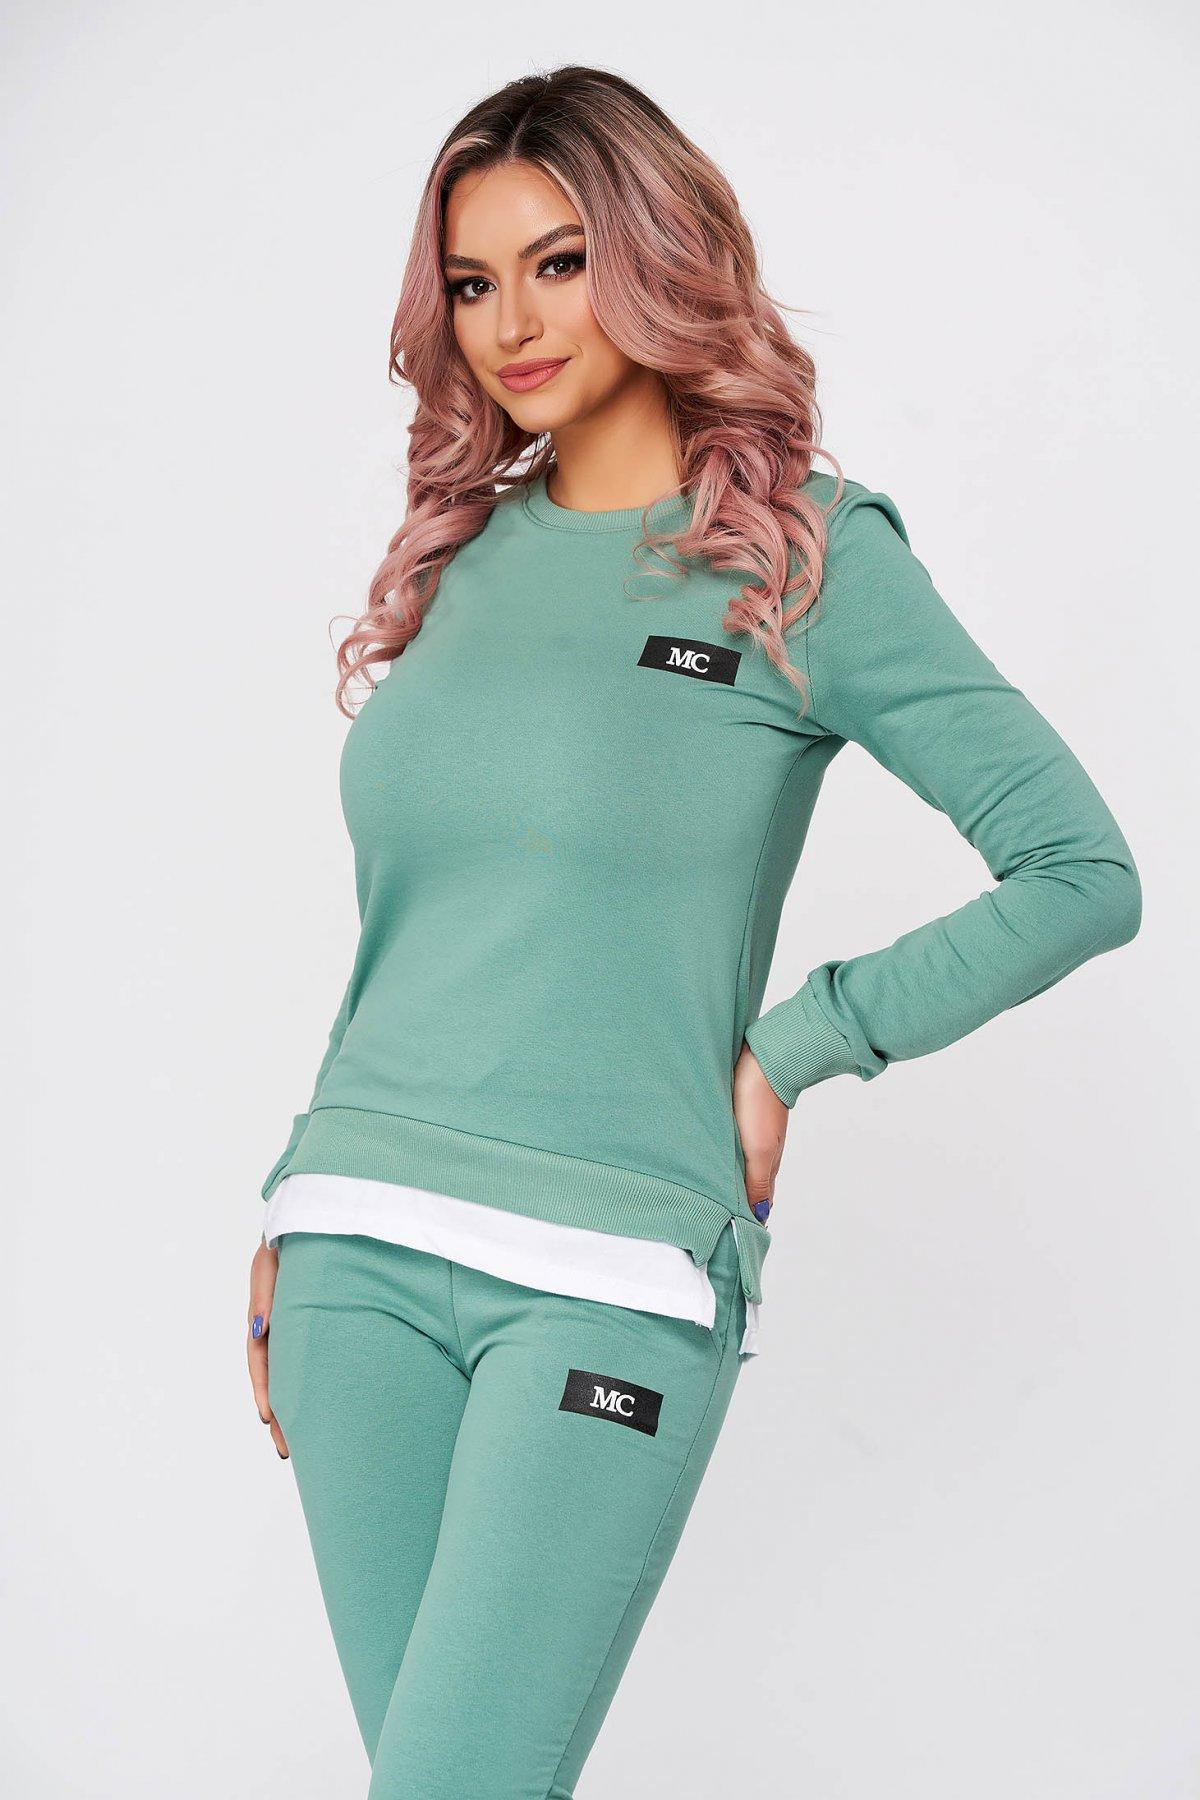 Trening dama SunShine verzi din 2 piese cu pantalon din bumbac usor elastic cu croi larg si slit lateral